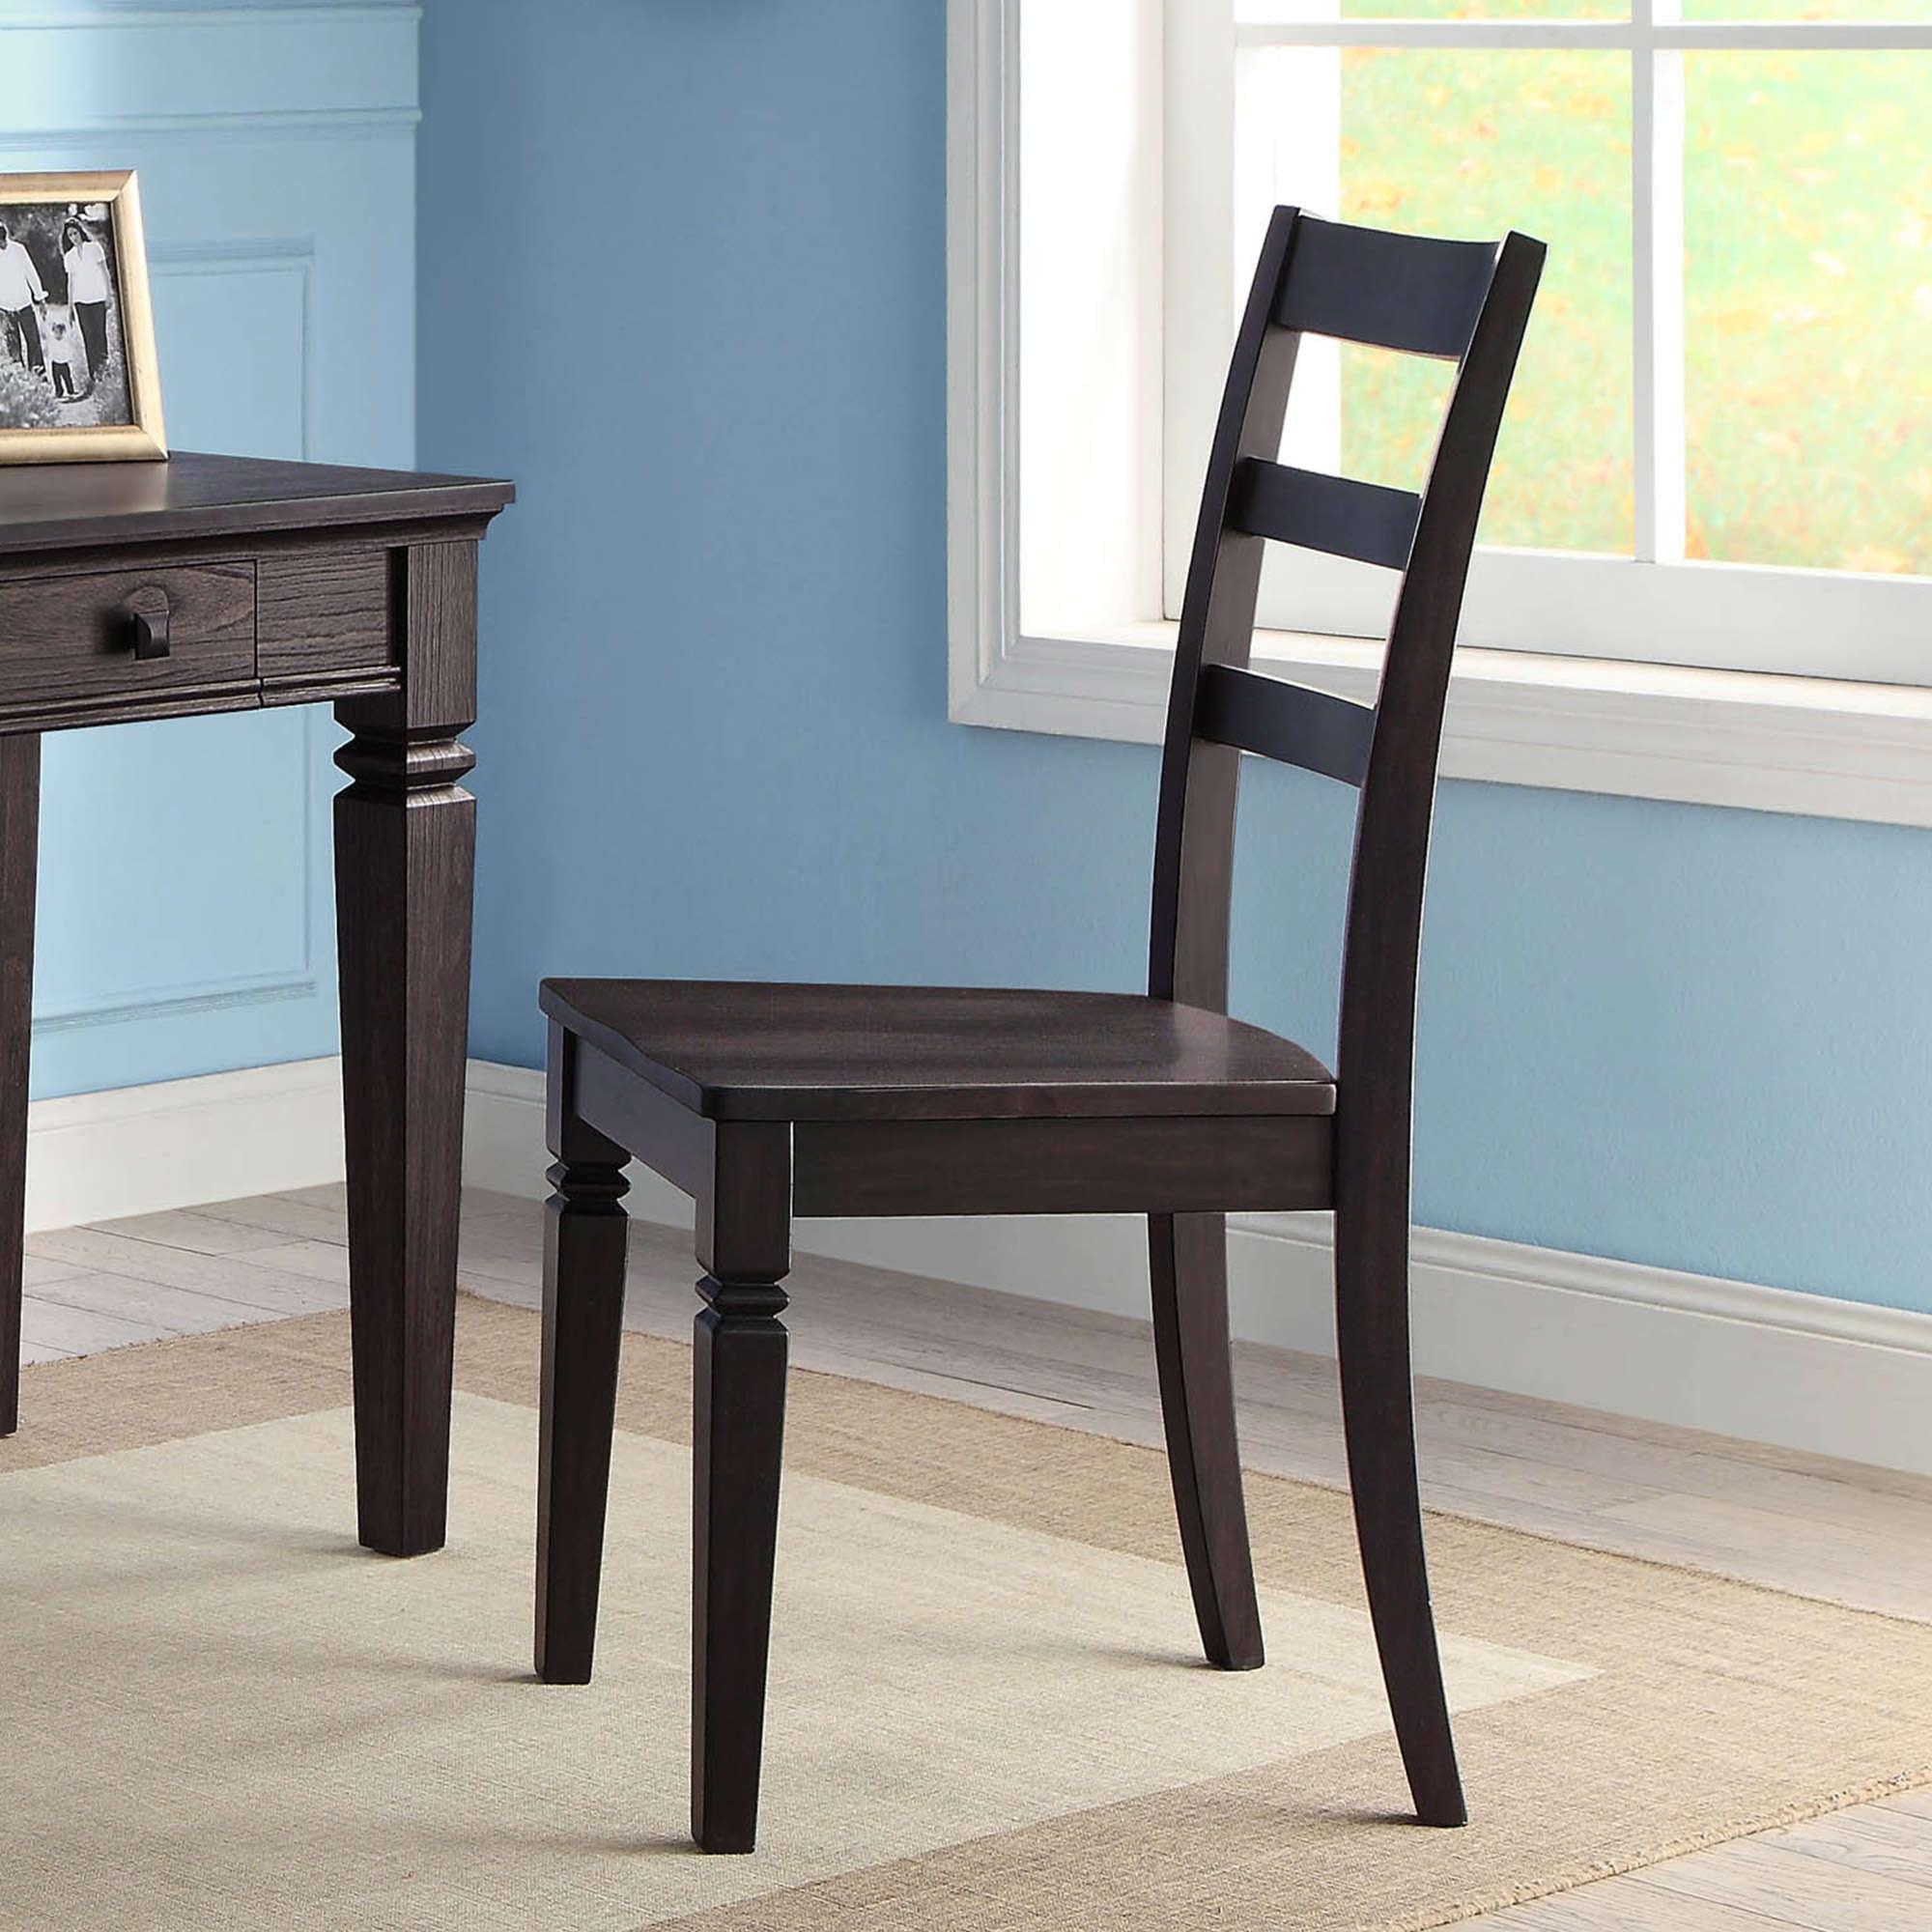 Picture of: Kendal Classic Cottage Style Wooden Desk Chair Dark Espresso Walmart Com Walmart Com